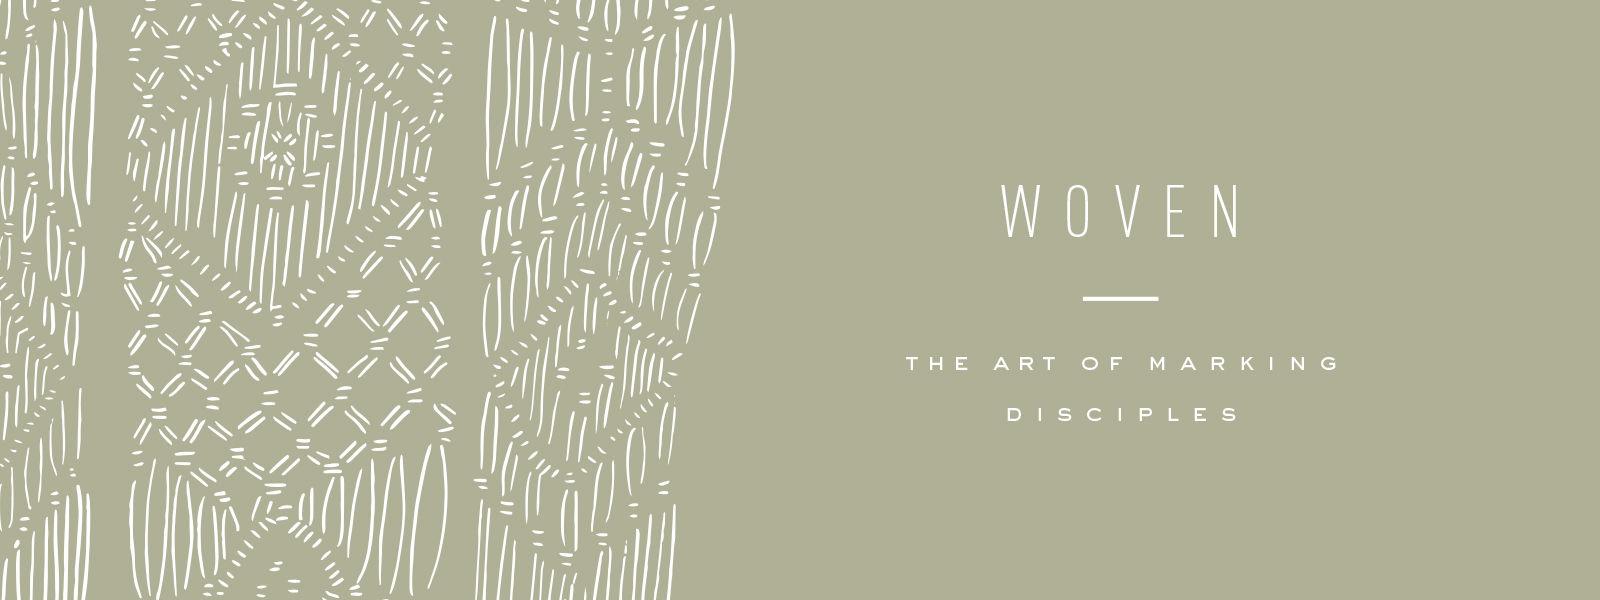 Woven - The Art of Discipleship